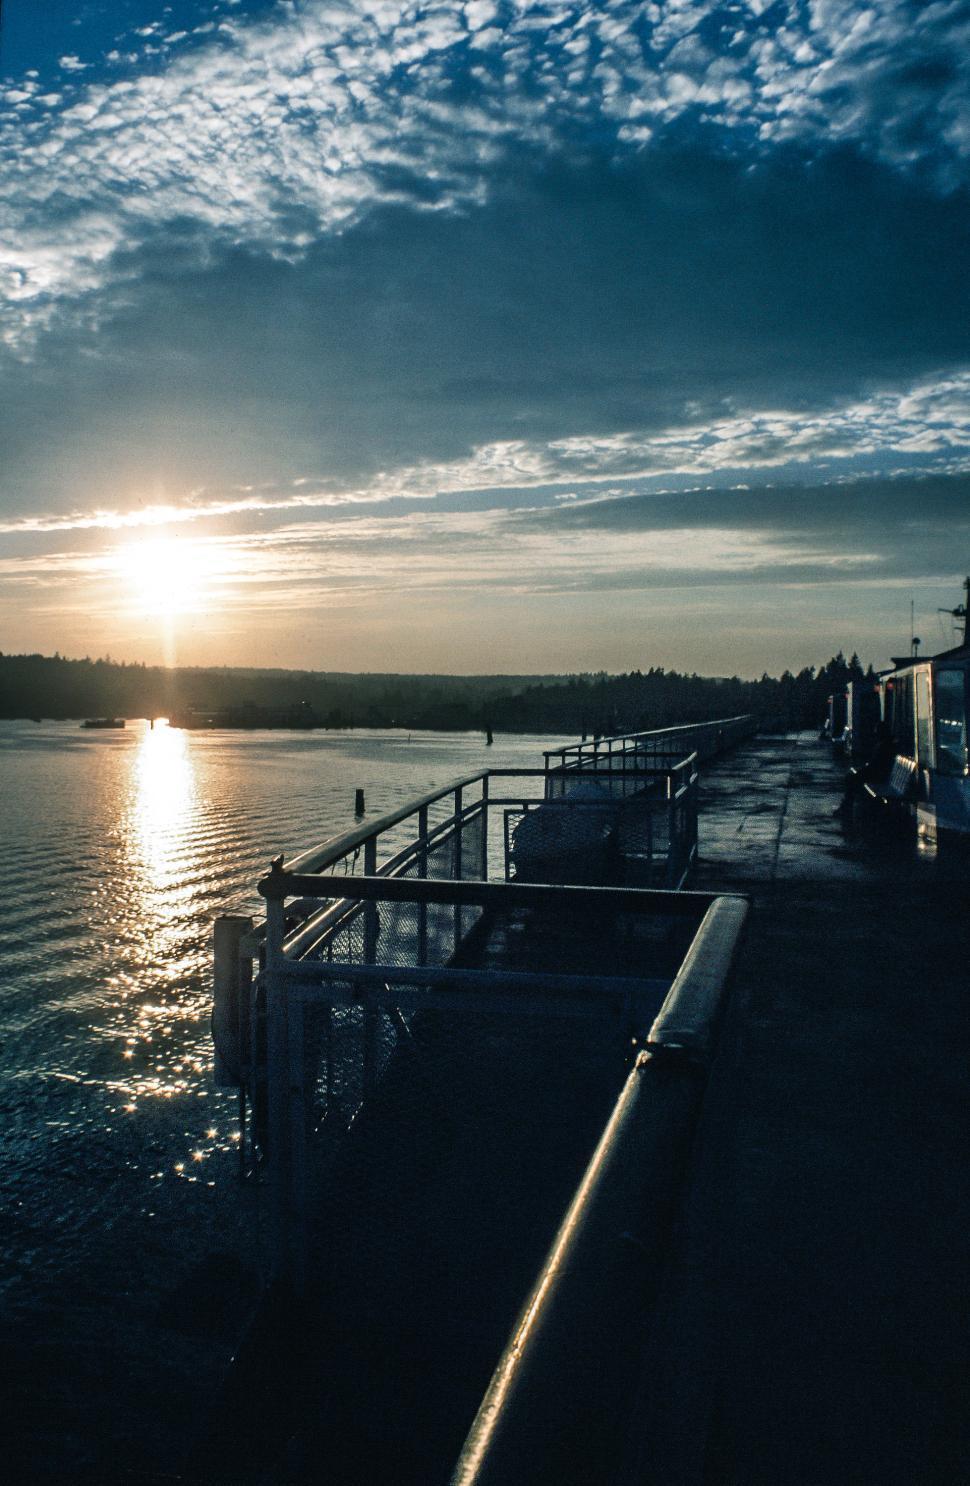 Download Free Stock HD Photo of Pier in Seattle Online